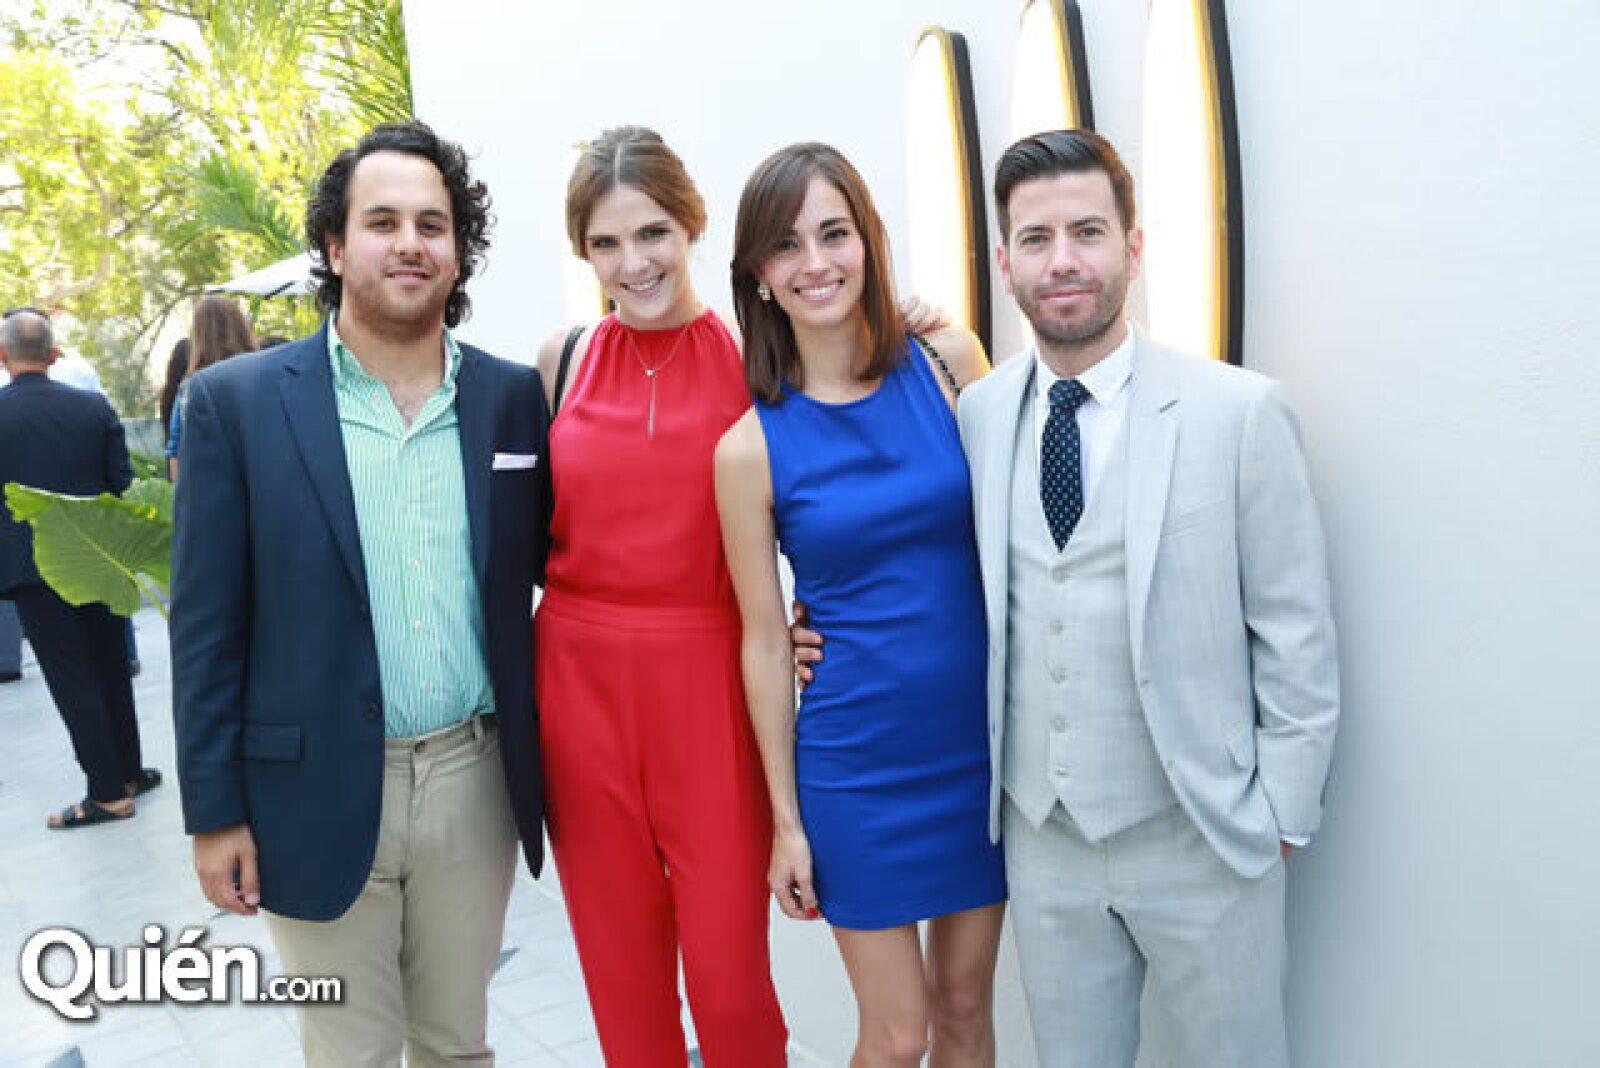 Rafa Guerrero,Marilú Hernández,Mmariana Peña y Daniel Gómez Álvarez